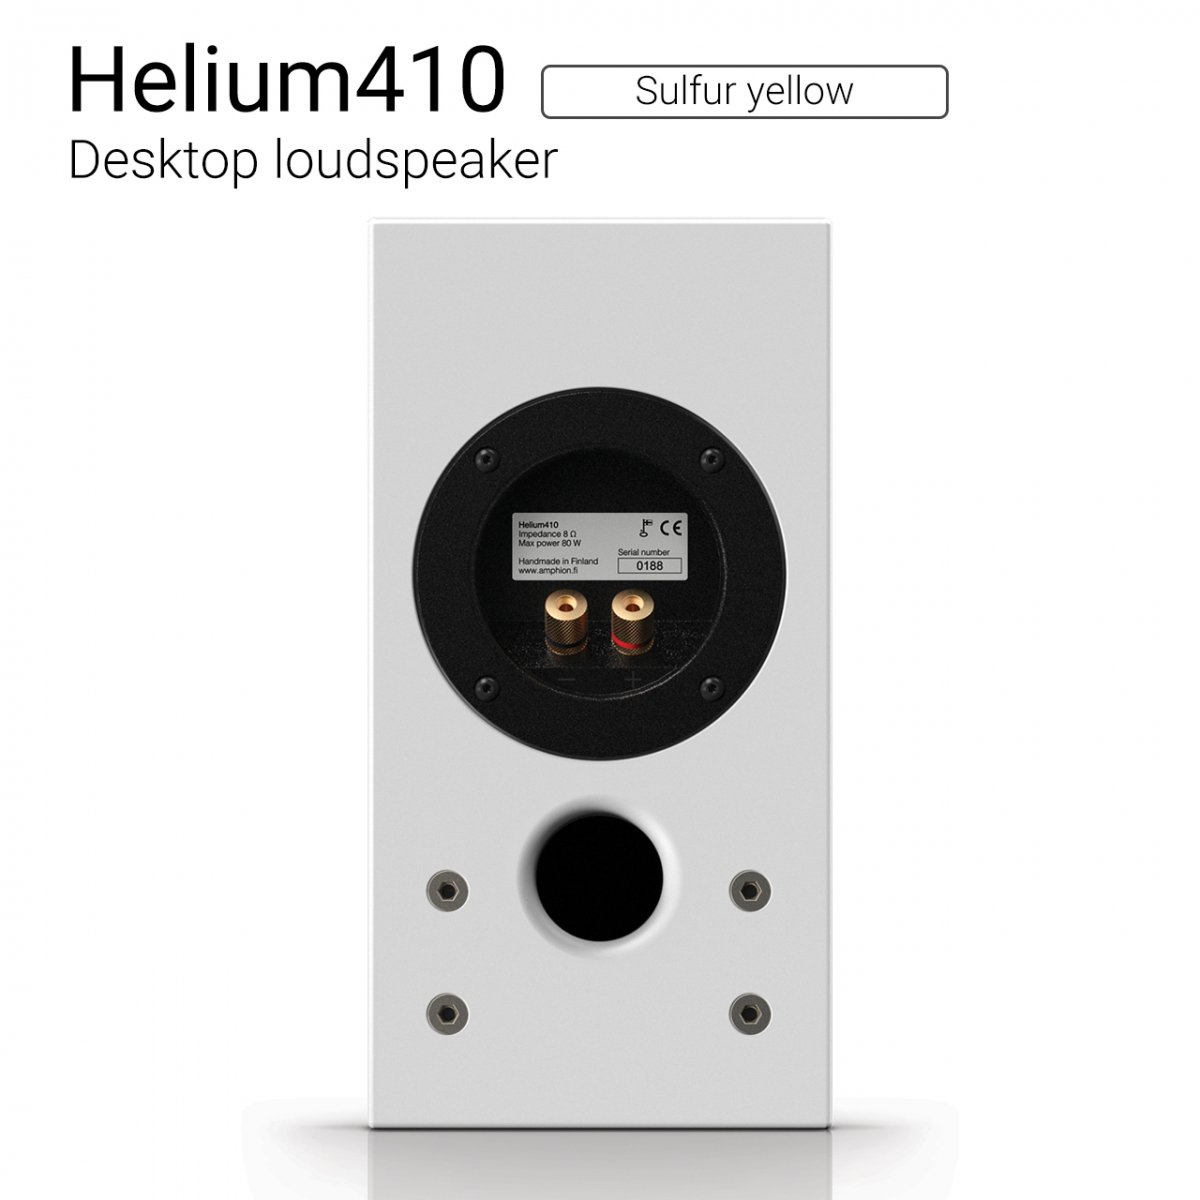 Helium410 (Sulfur yellow) Desktop loudspeaker【ペア】